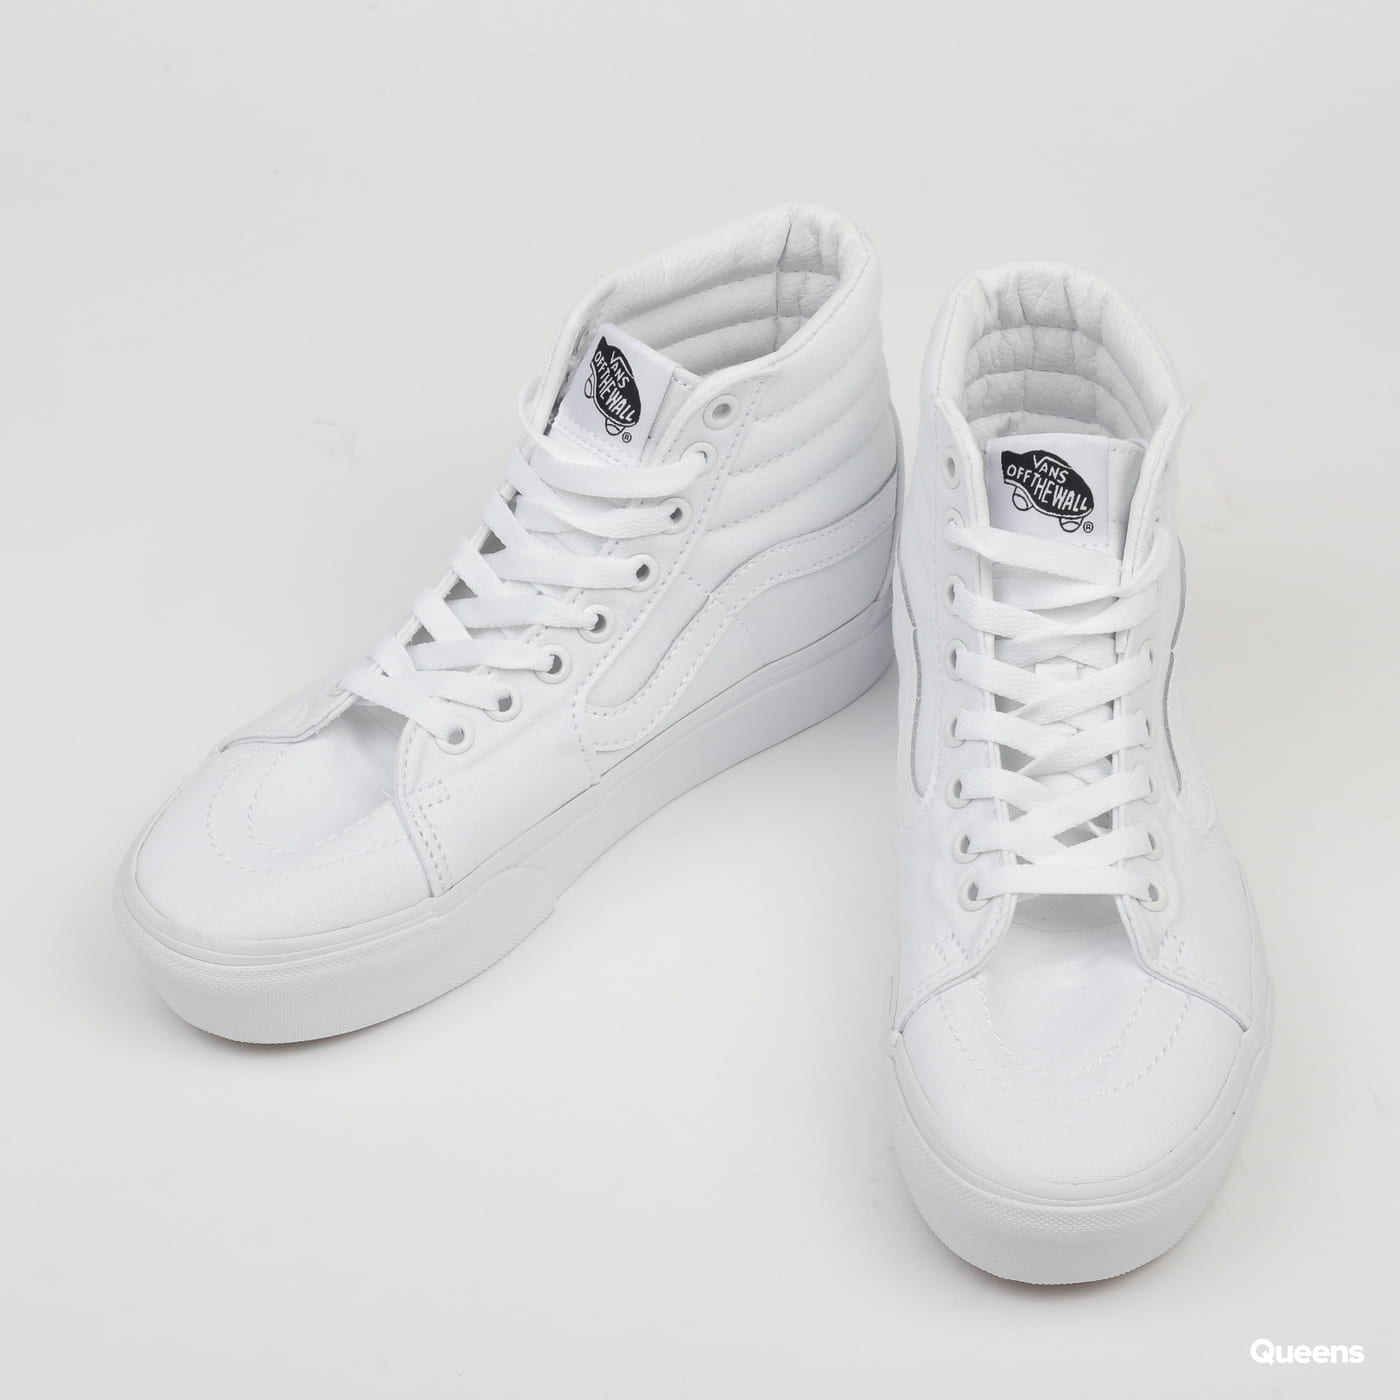 Vans SK8-HI Platform 2 true white / true white